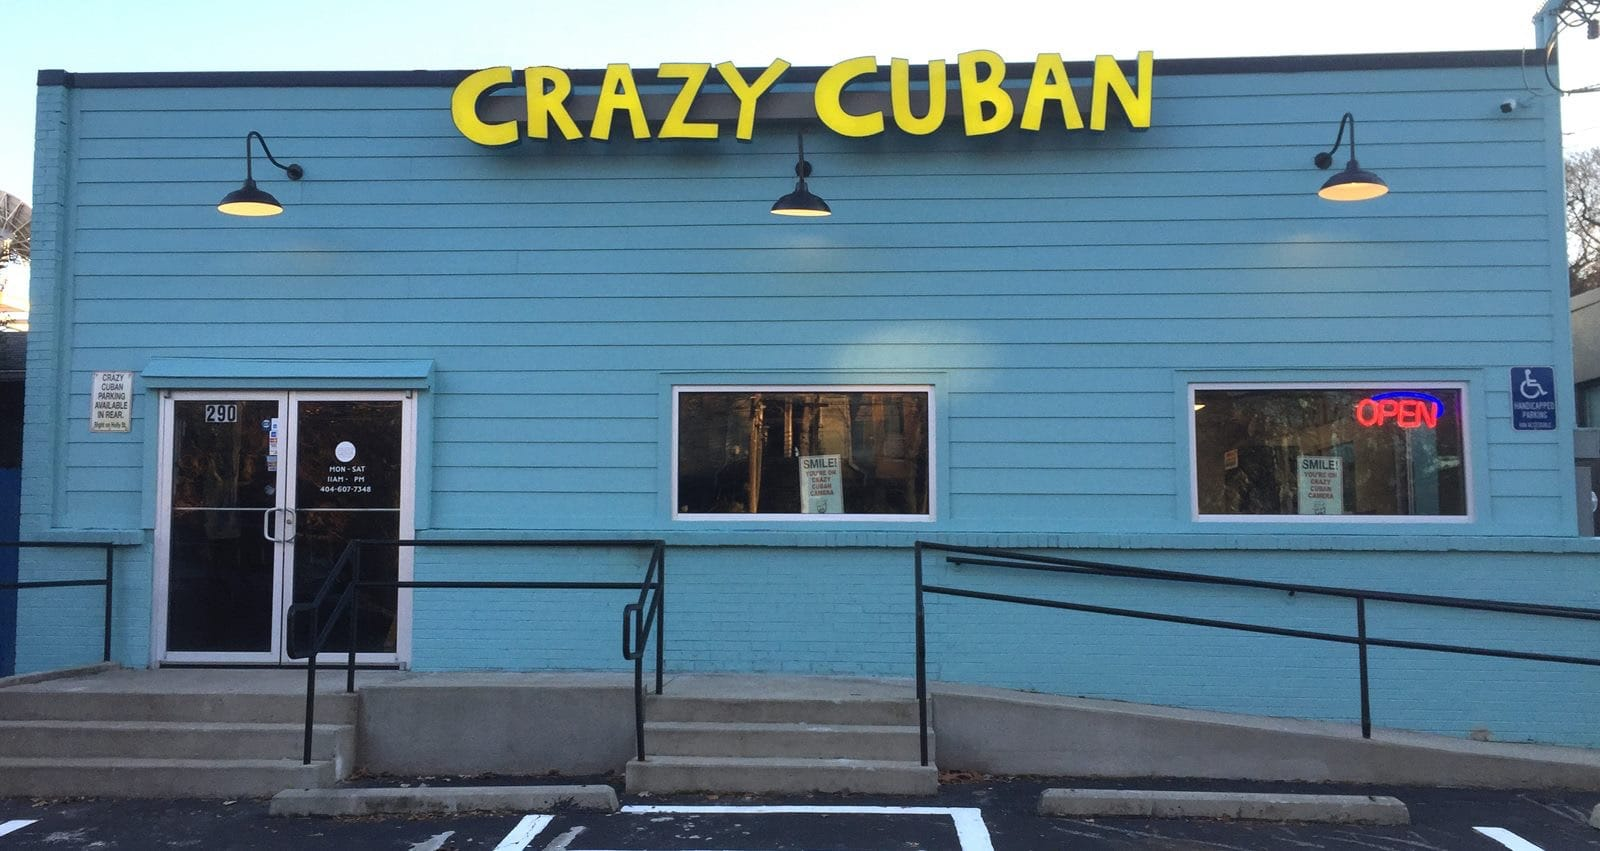 Crazy Cuban After